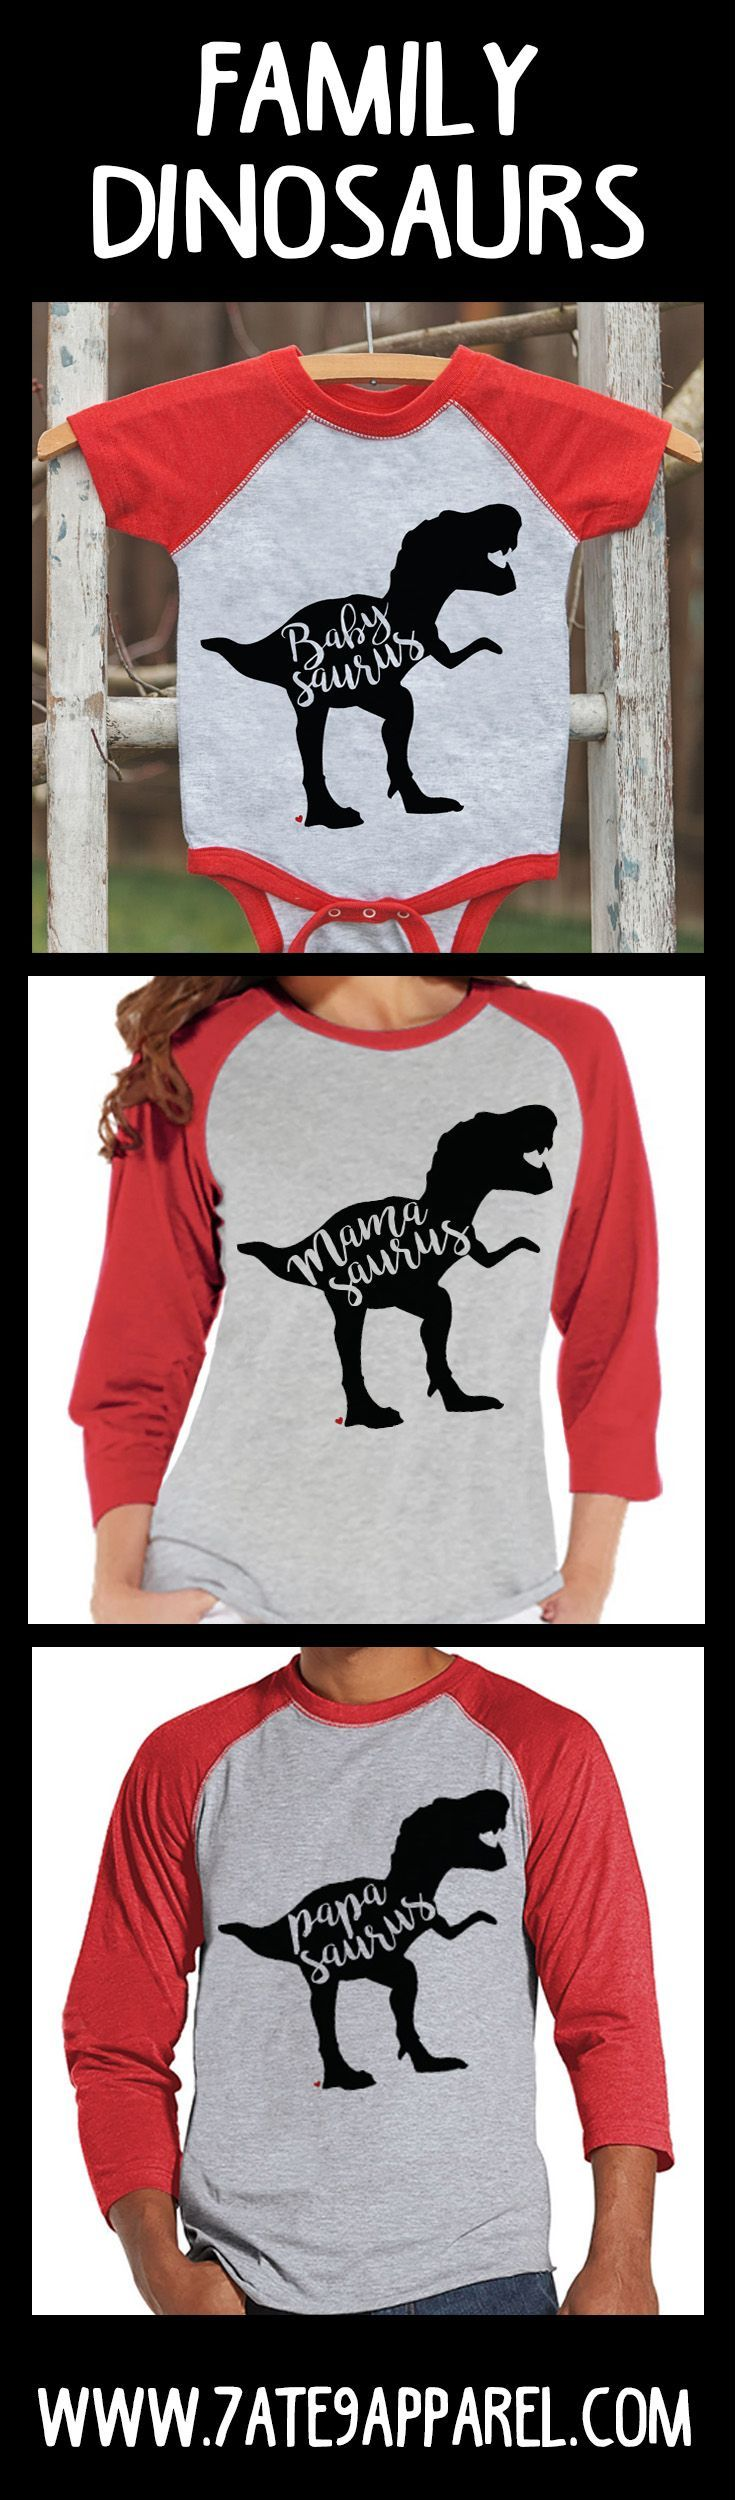 Dinosaur shirts for Mom, Dad, and kids! Babysaurus, Mamasaurus, Papasaurus - men casual shirts, shirt shirt, mens white shirts *sponsored https://www.pinterest.com/shirts_shirt/ https://www.pinterest.com/explore/shirt/ https://www.pinterest.com/shirts_shirt/sleeveless-shirts/ http://www.patagonia.com/shop/womens-shirts